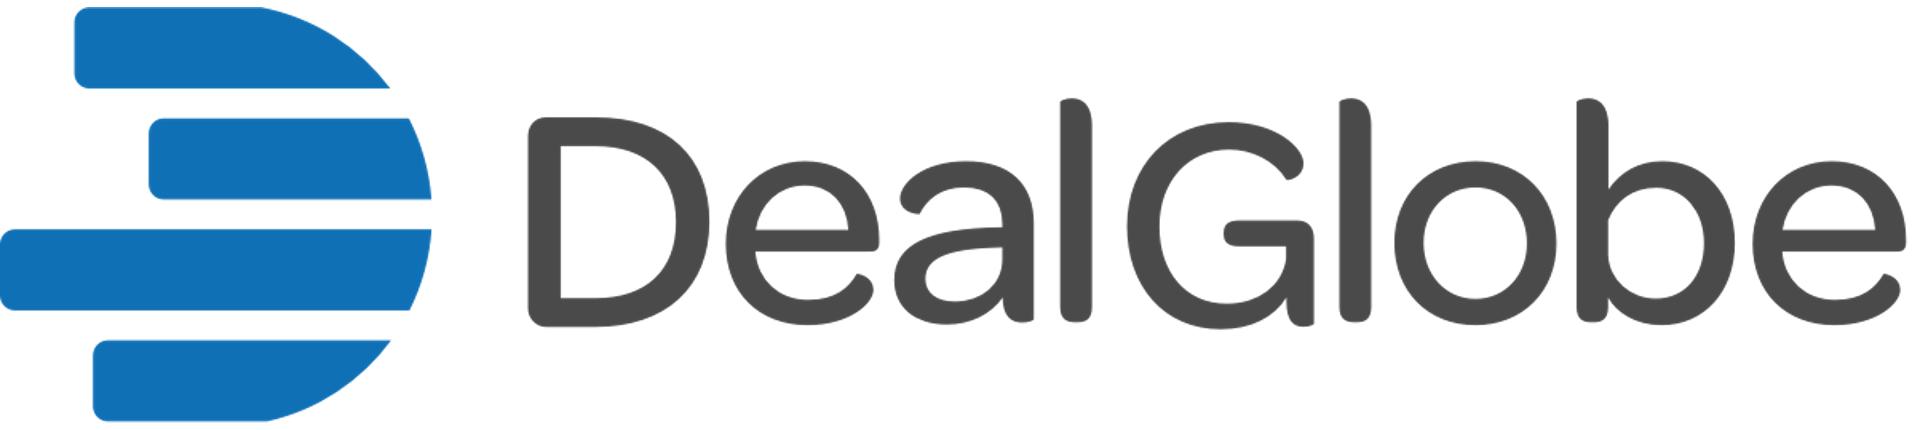 DealGlobe EN logo white background - Copy